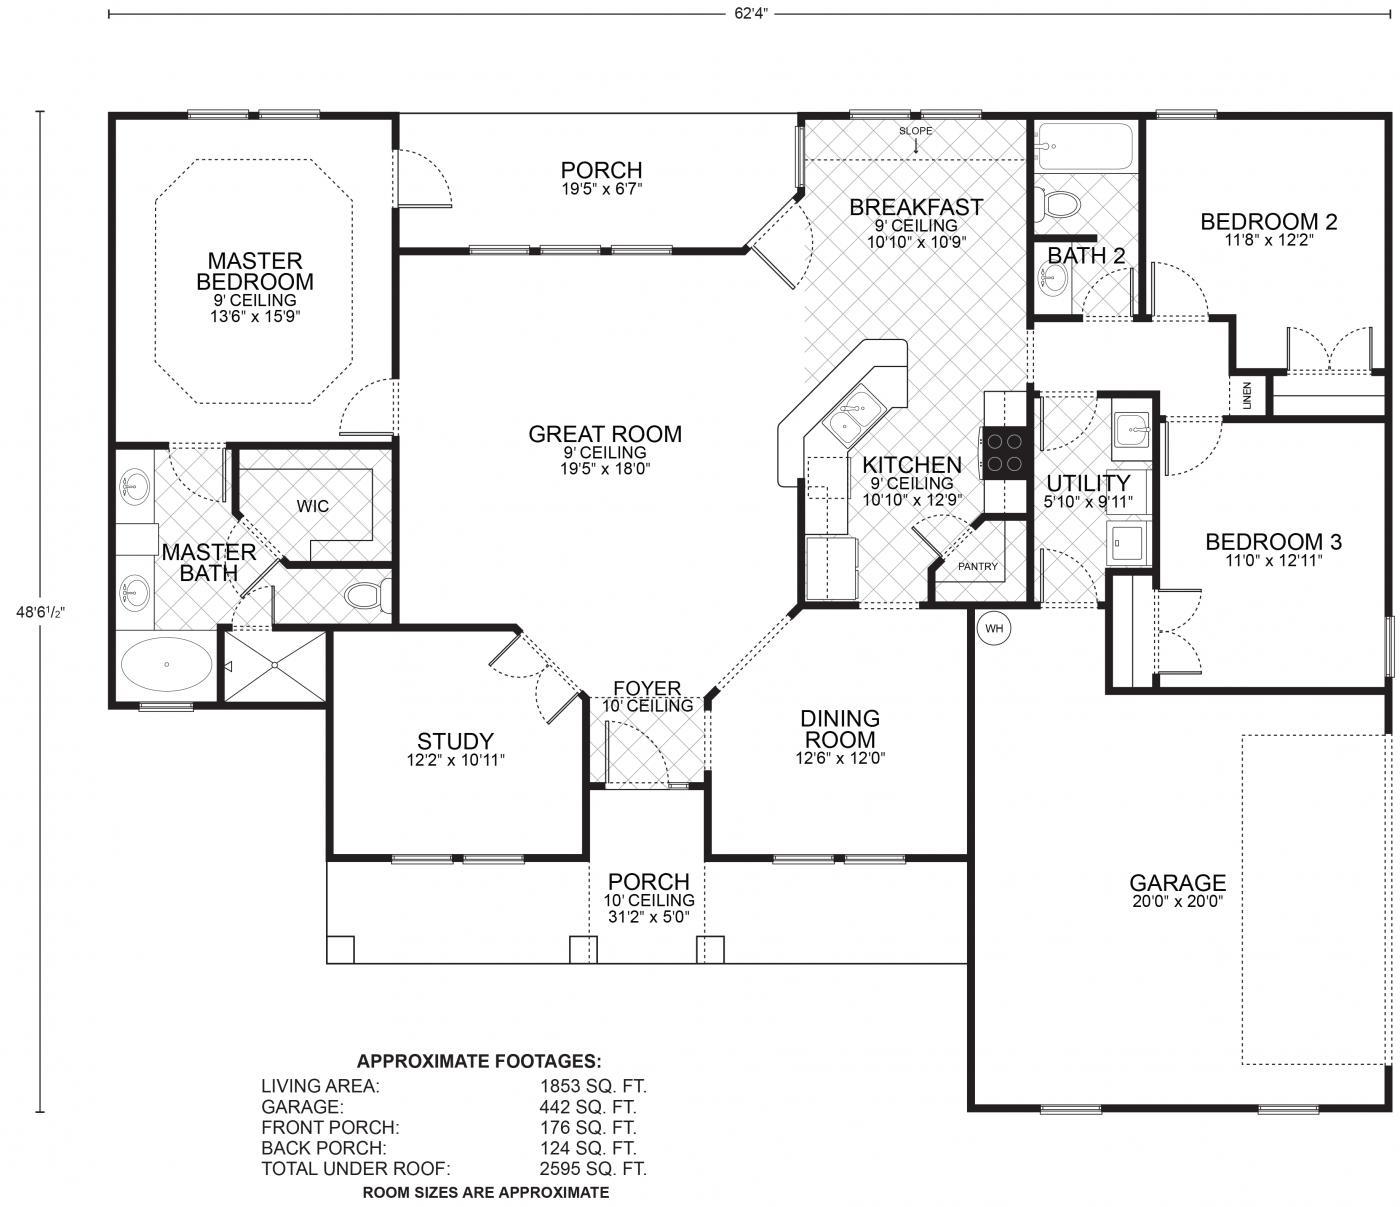 19 durango floor plans southwest homes plan 2335 for Southwest homes floor plans